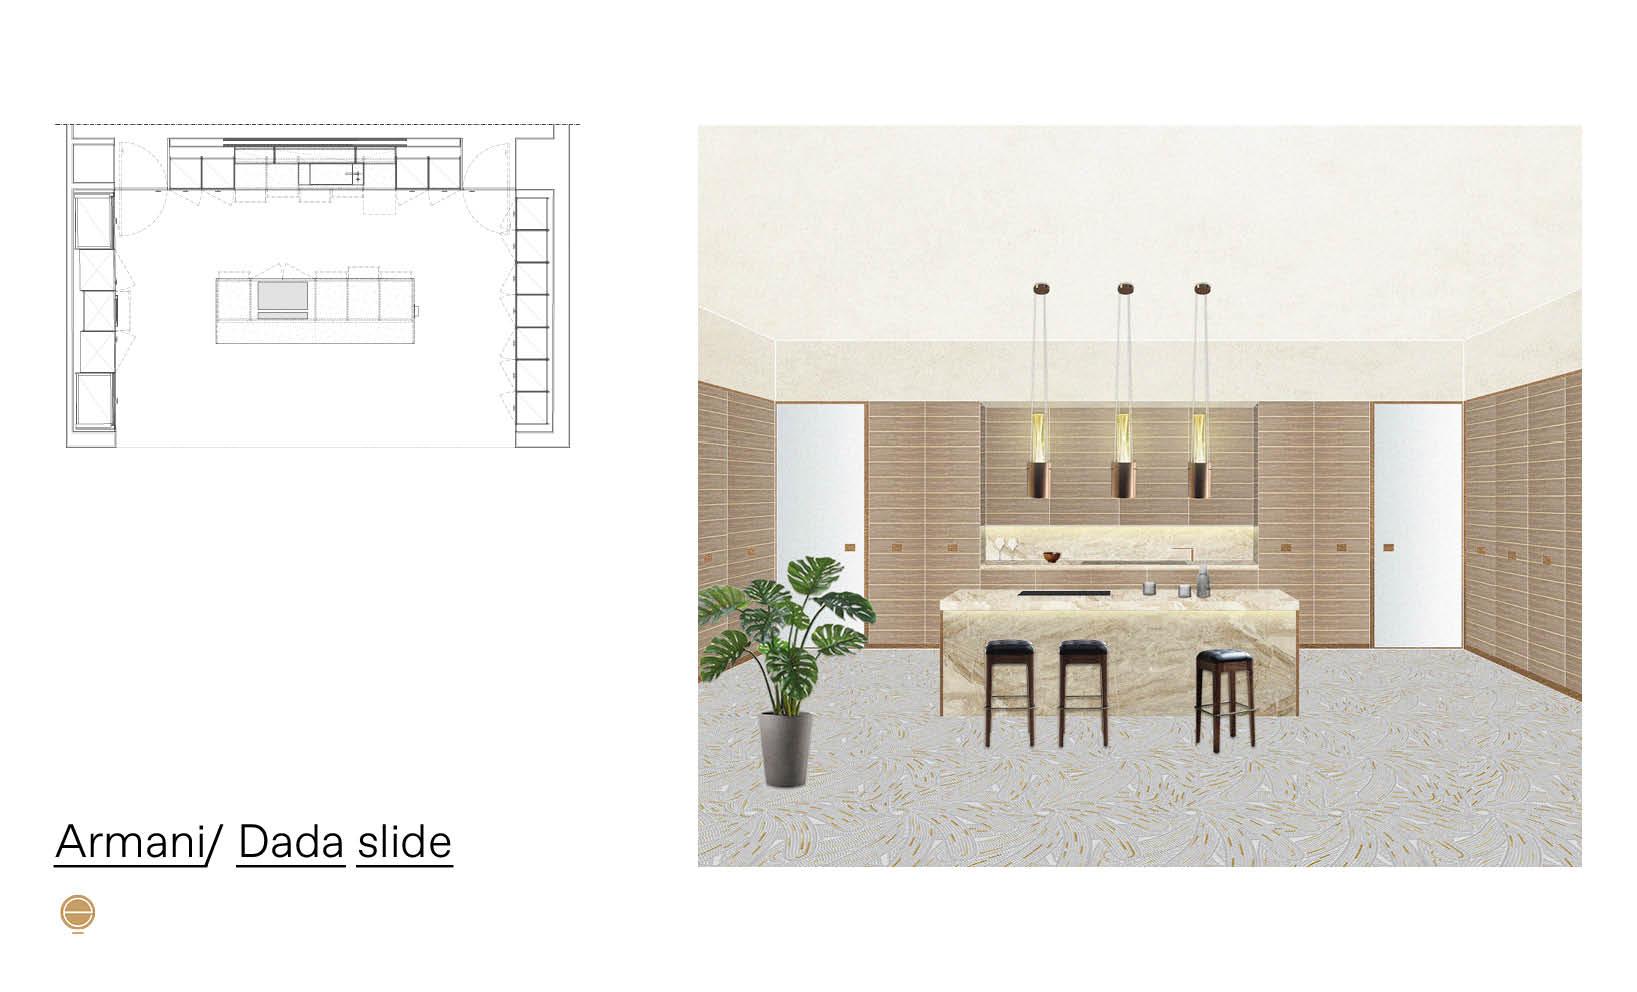 Armani Dada Slide luxury modular kitchen project inspiration designed by Esperiri